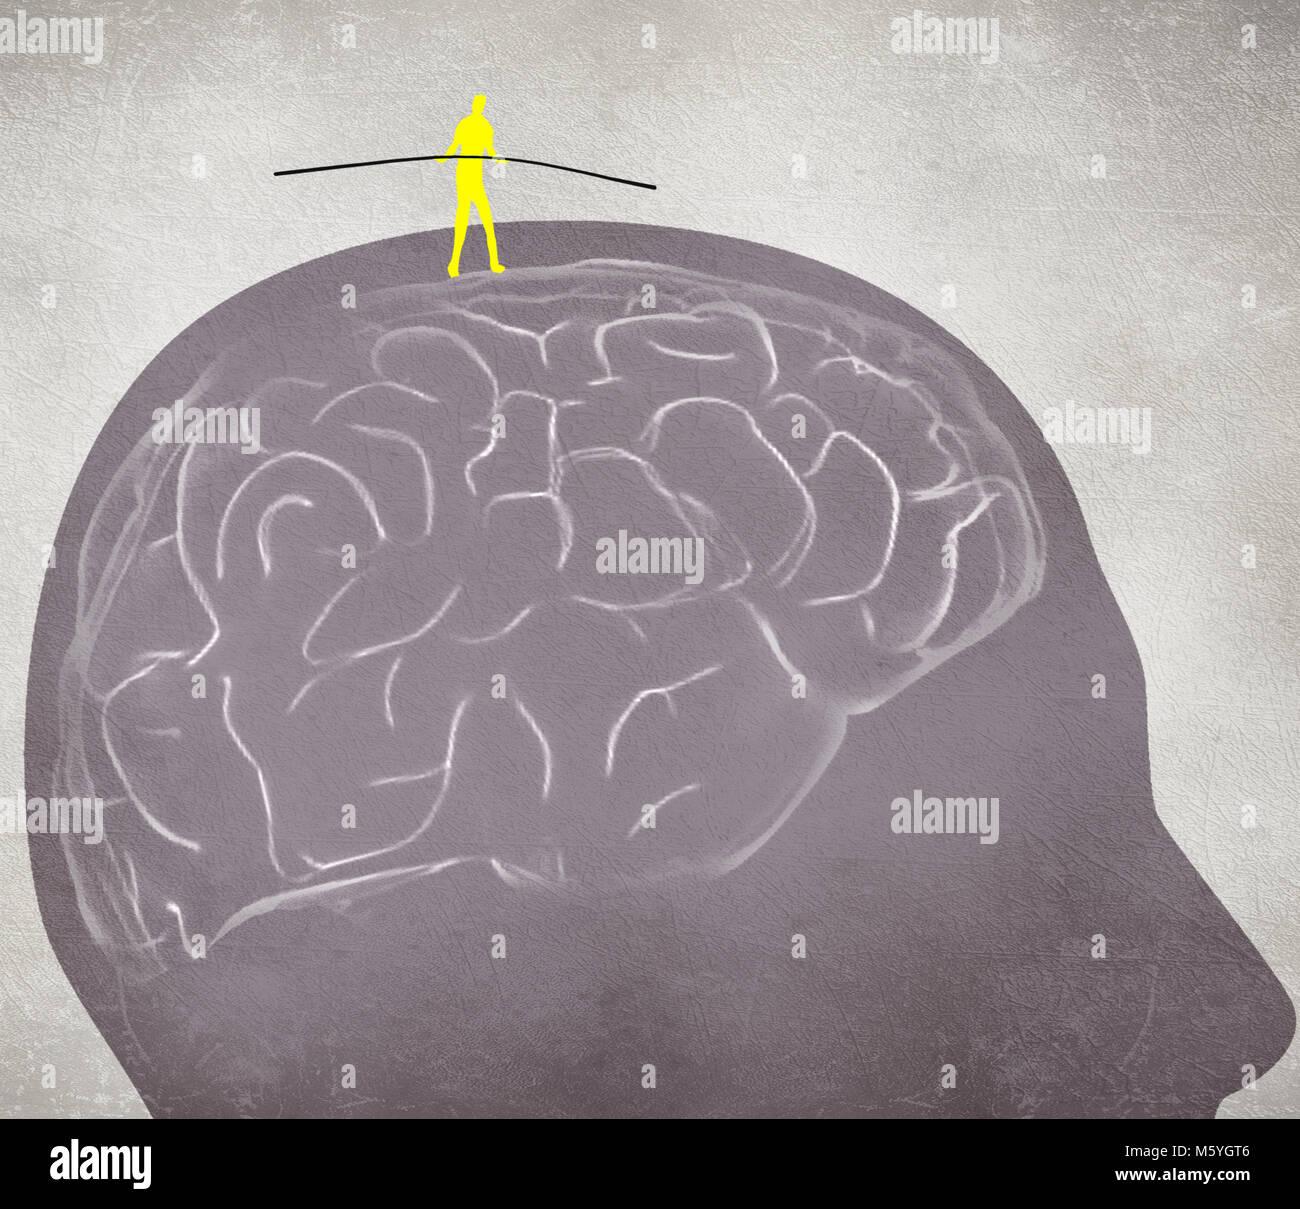 equilibrist walking on the brain digital illustration - Stock Image